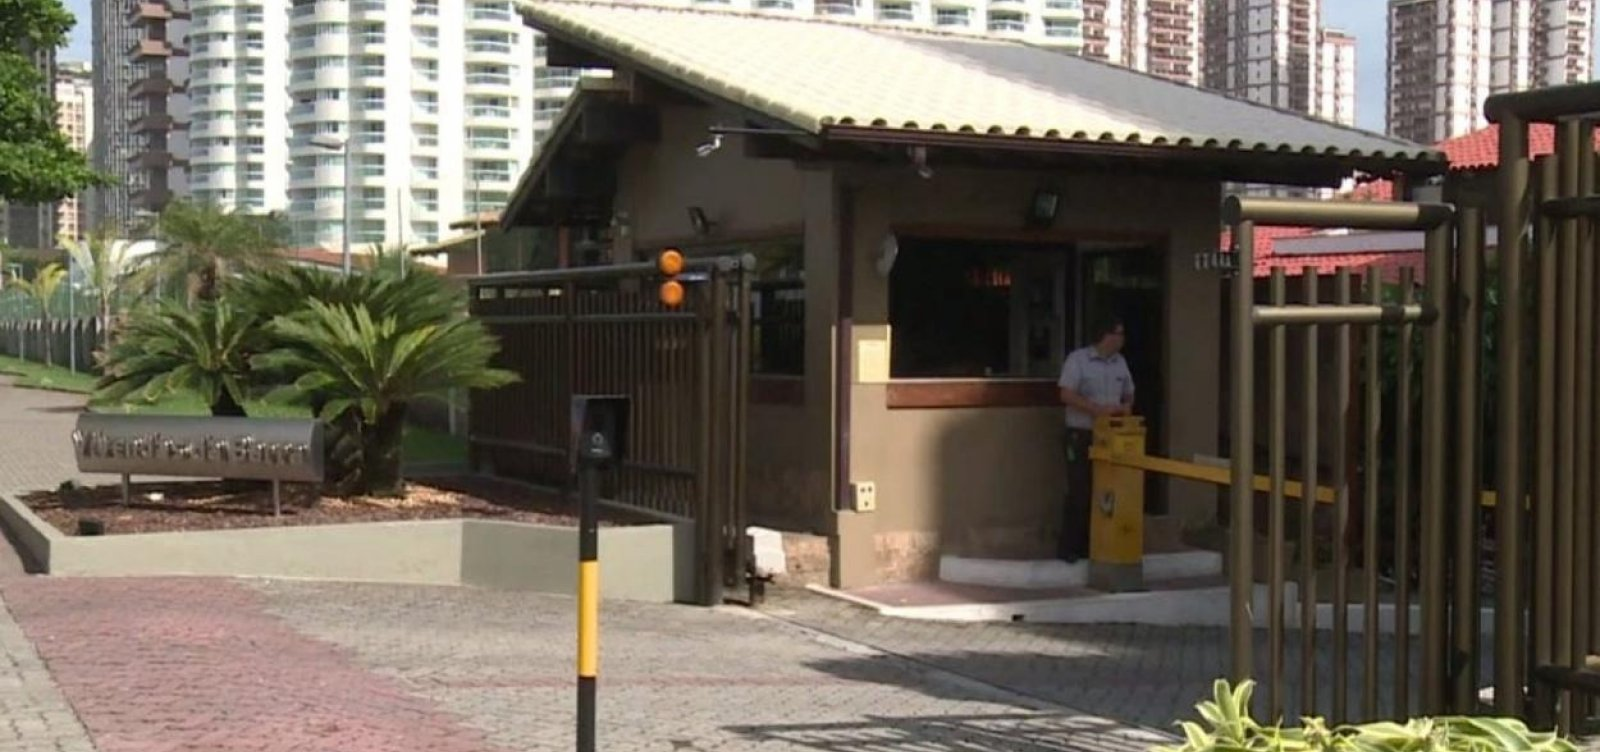 [Delegado admite erroque adiou inclusão de condomínio de Bolsonaro no caso Marielle]